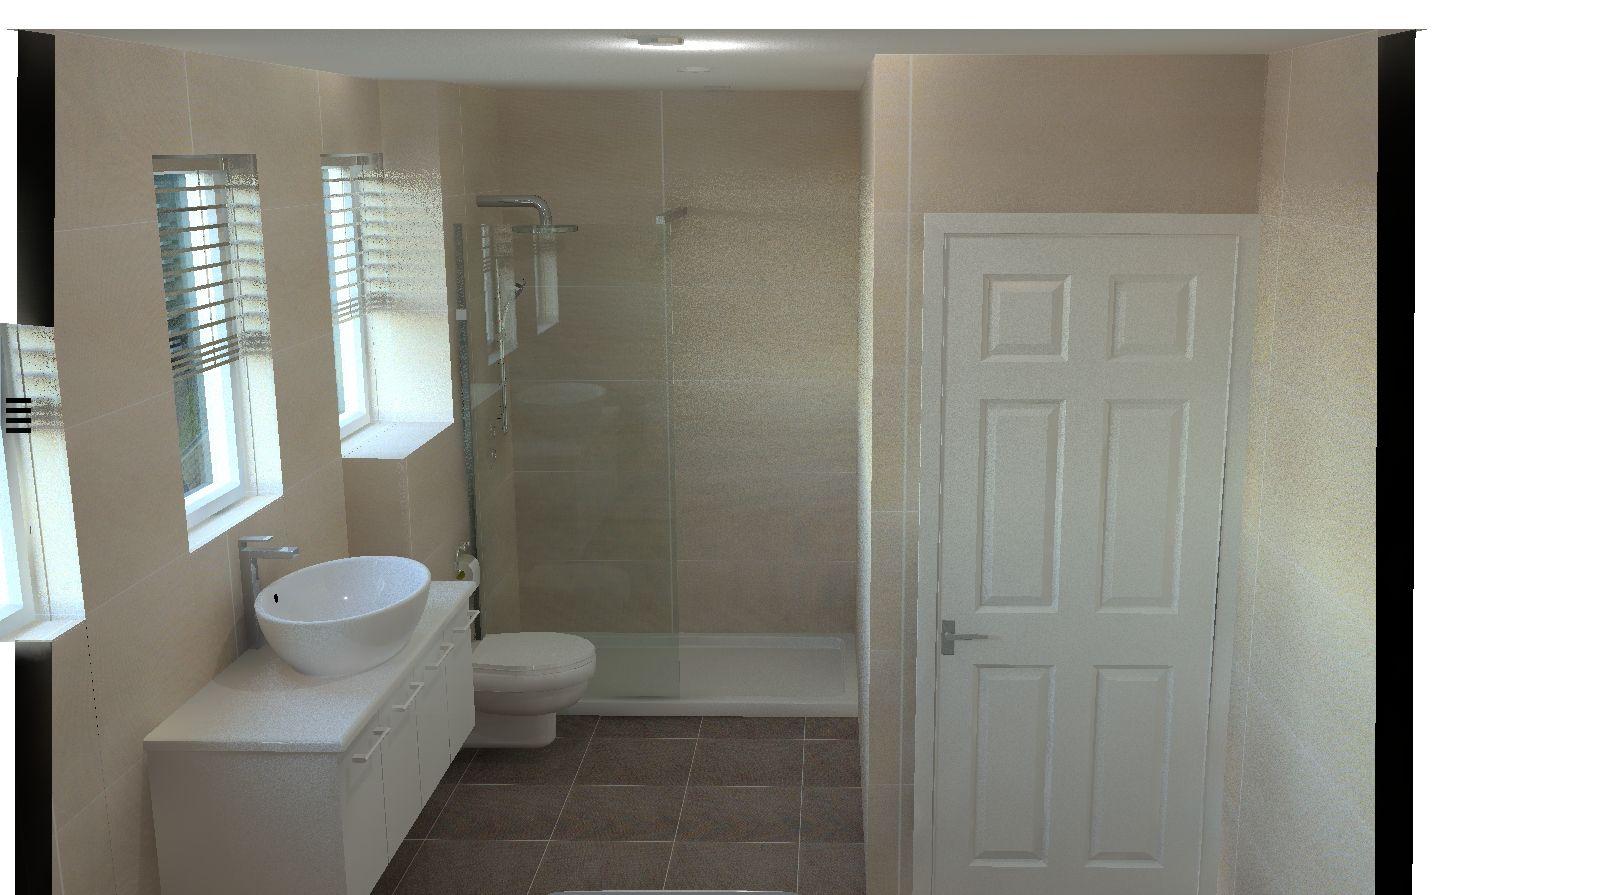 Lovely modern bathroom design | Our ArtiCad Designs | Pinterest ...